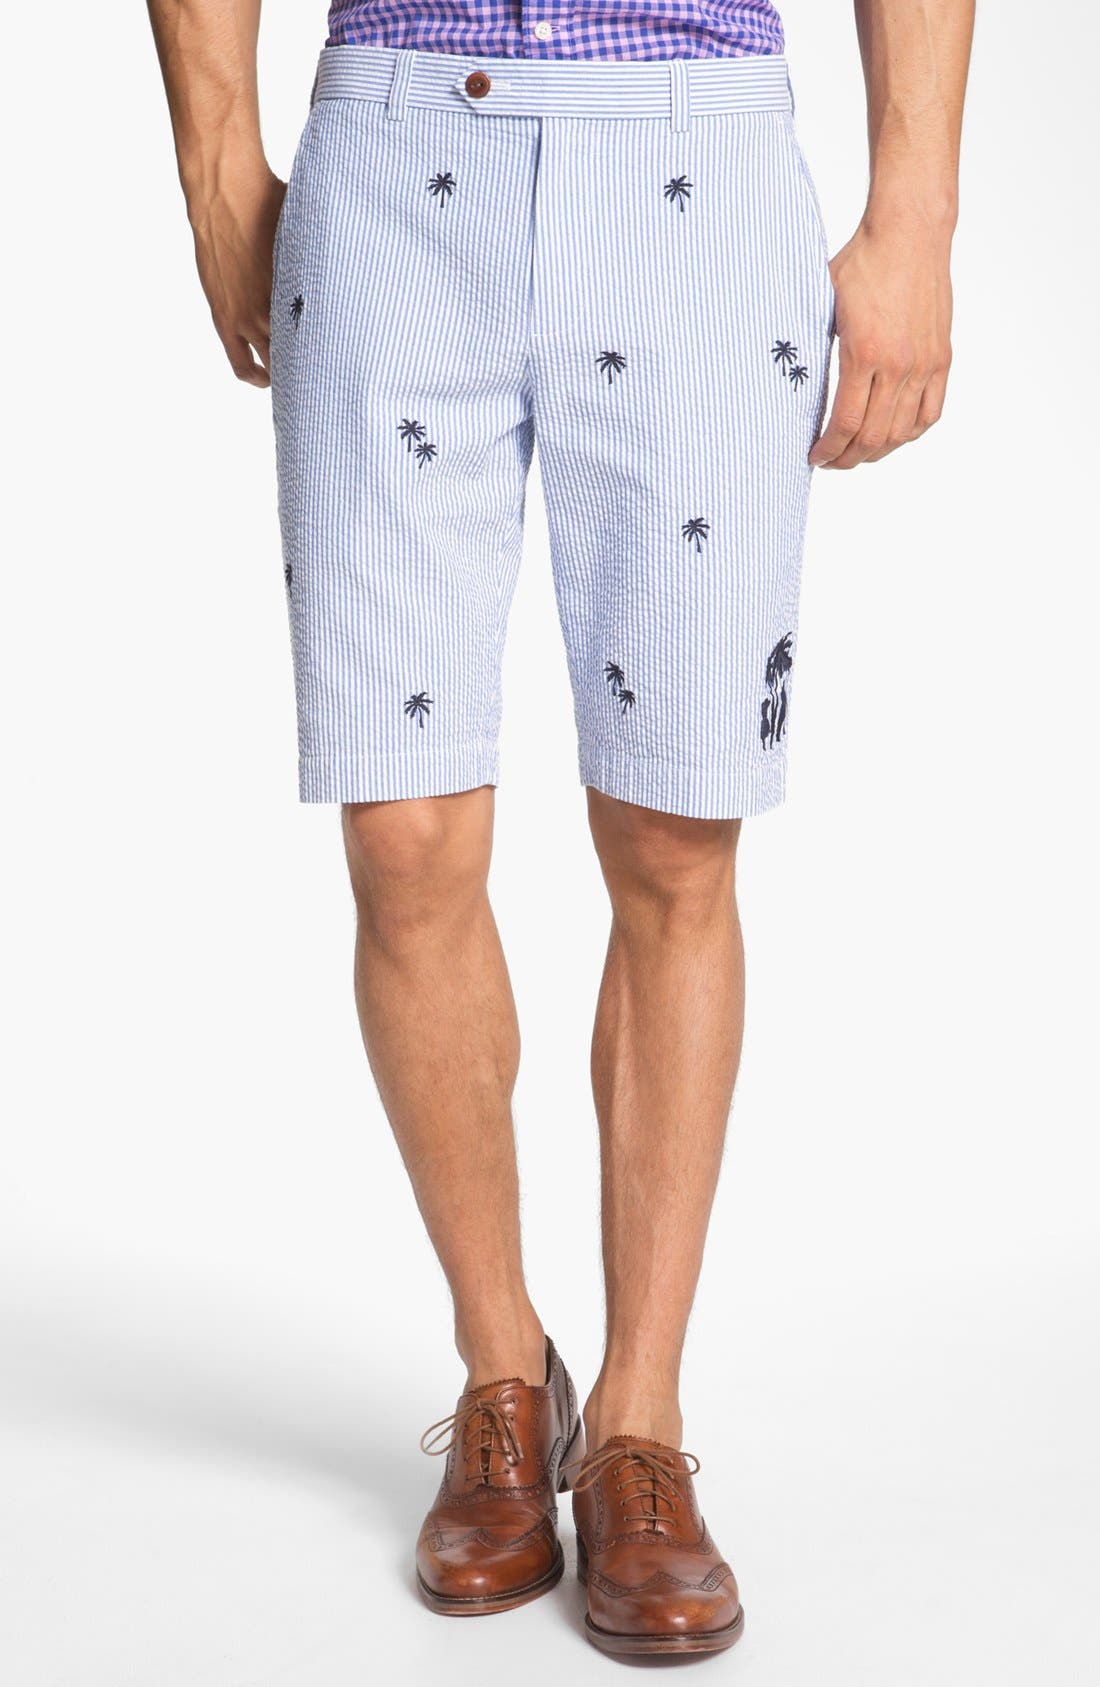 Alternate Image 1 Selected - Brooks Brothers 'Luau' Bermuda Fit Seersucker Shorts